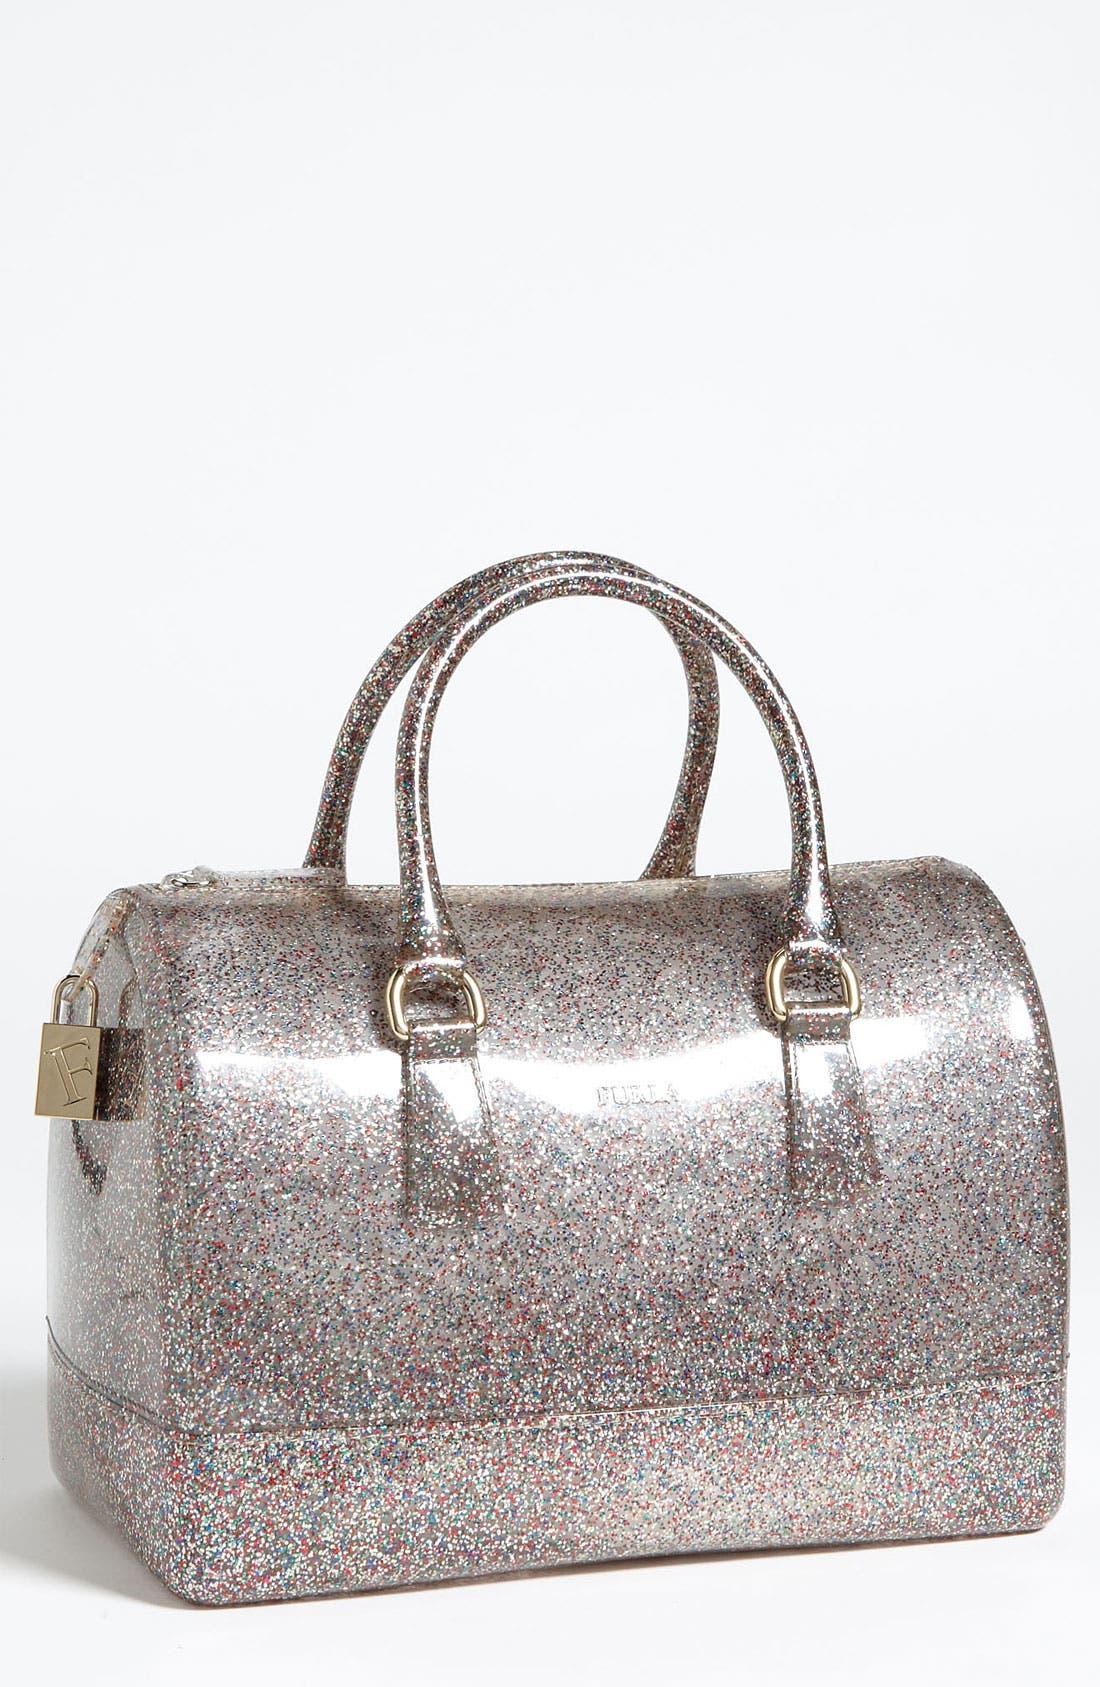 FURLA 'Candy - Glitter' Rubber Satchel, Main, color, 040